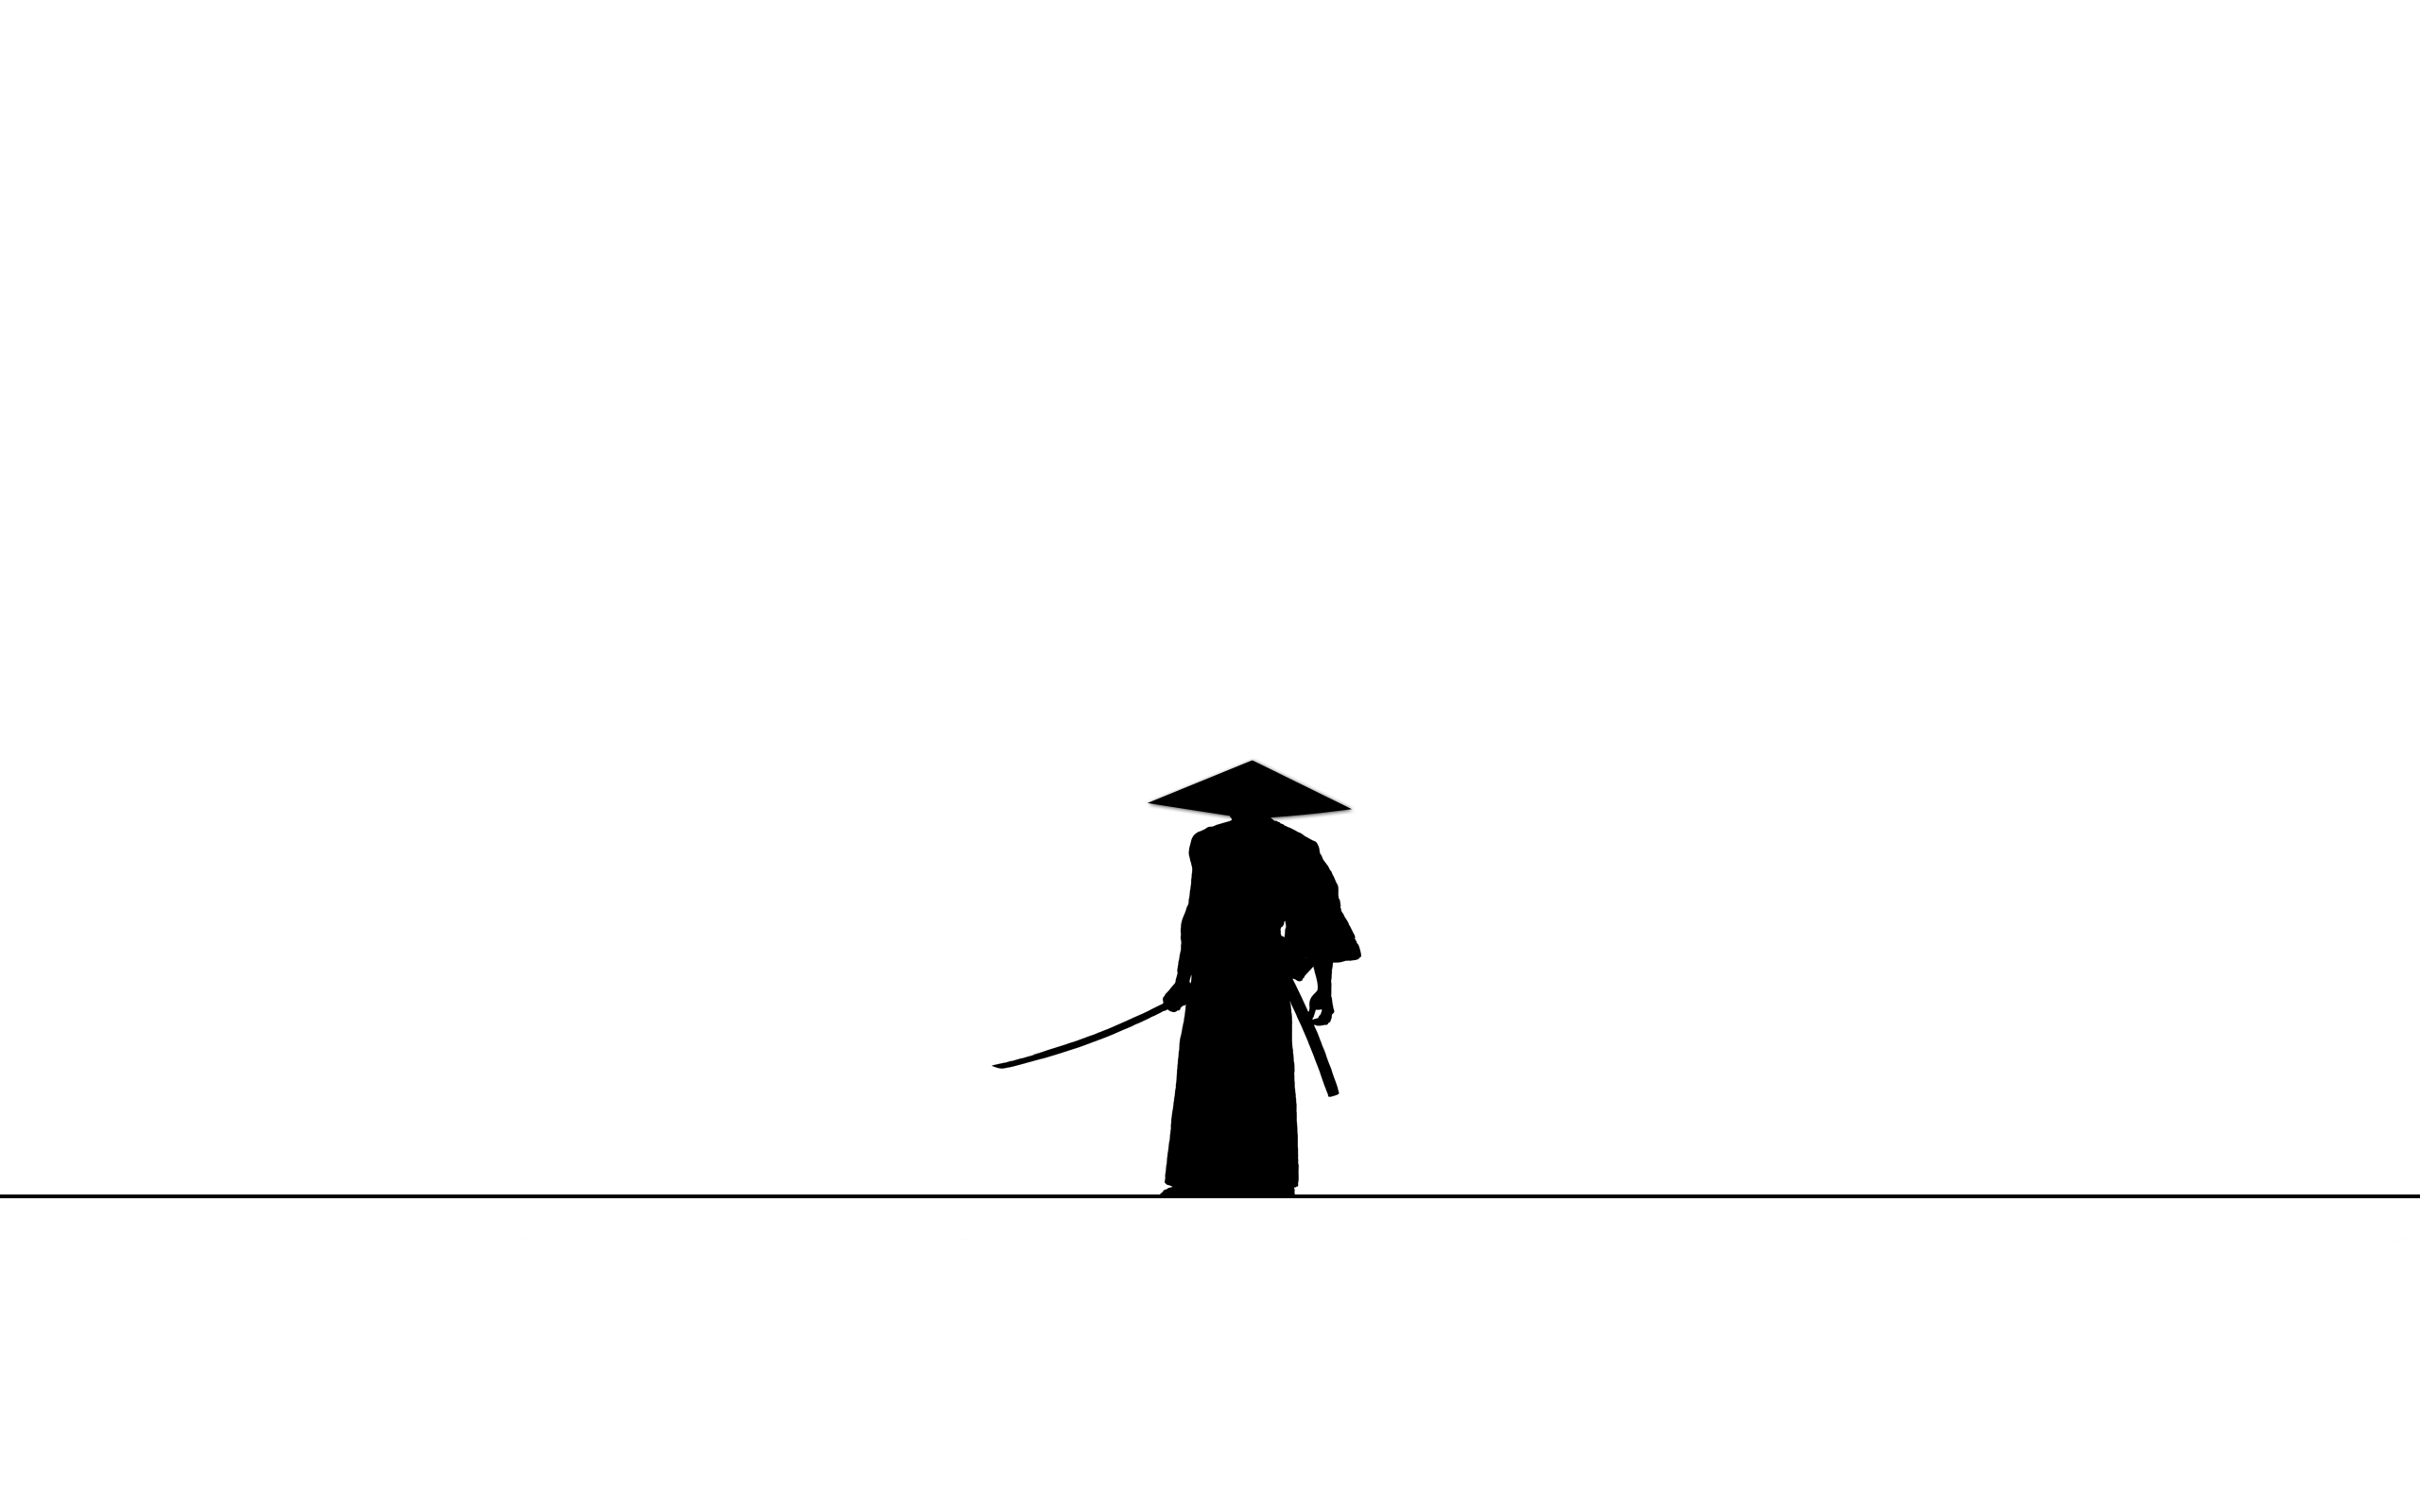 General 2560x1600 samurai minimalism silhouette simple background katana Samurai Jack